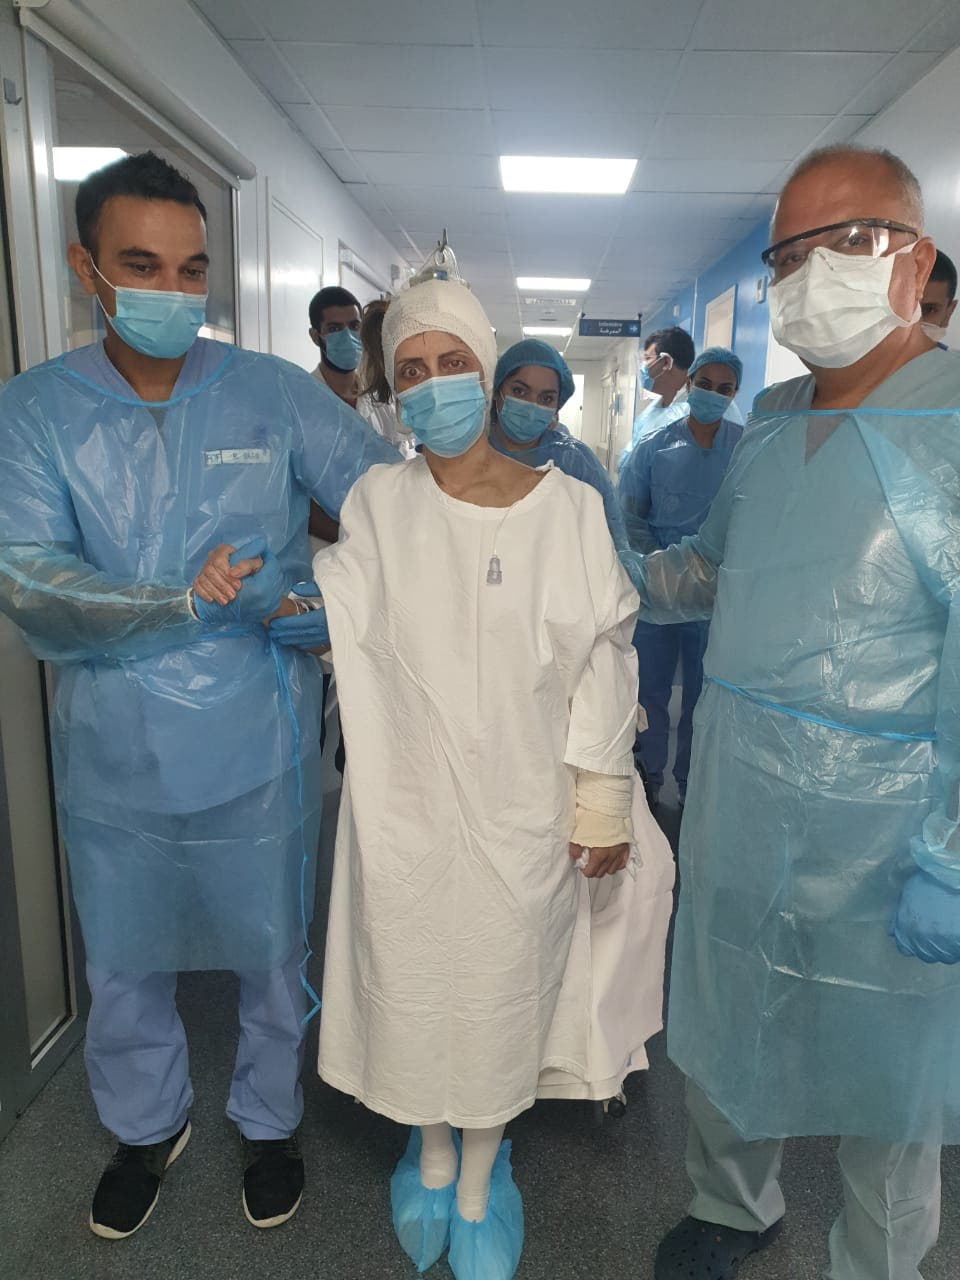 Rita Freiha Khoury, a Beirut blast victim, in the hospital (Supplied)